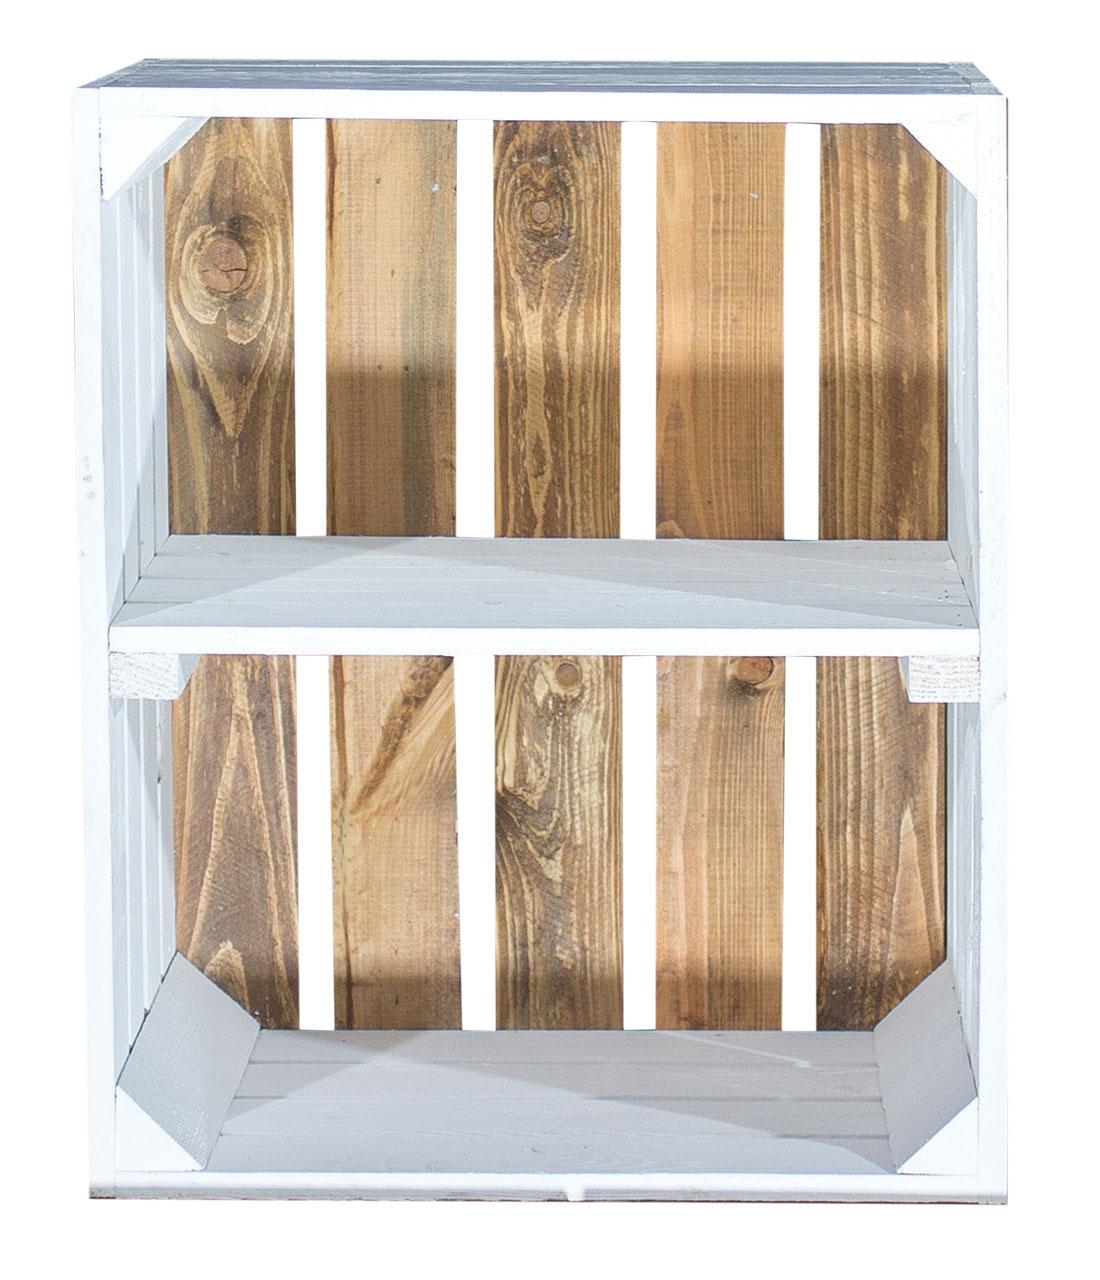 Full Size of Farbige Kisten Weies Regal Apfelkiste Weier Boden 50x40x30cm Schlafzimmer Raumteiler Wandregal Küche Regale Für Keller Landhausstil Dachschrägen Hängeregal Regal Kisten Regal